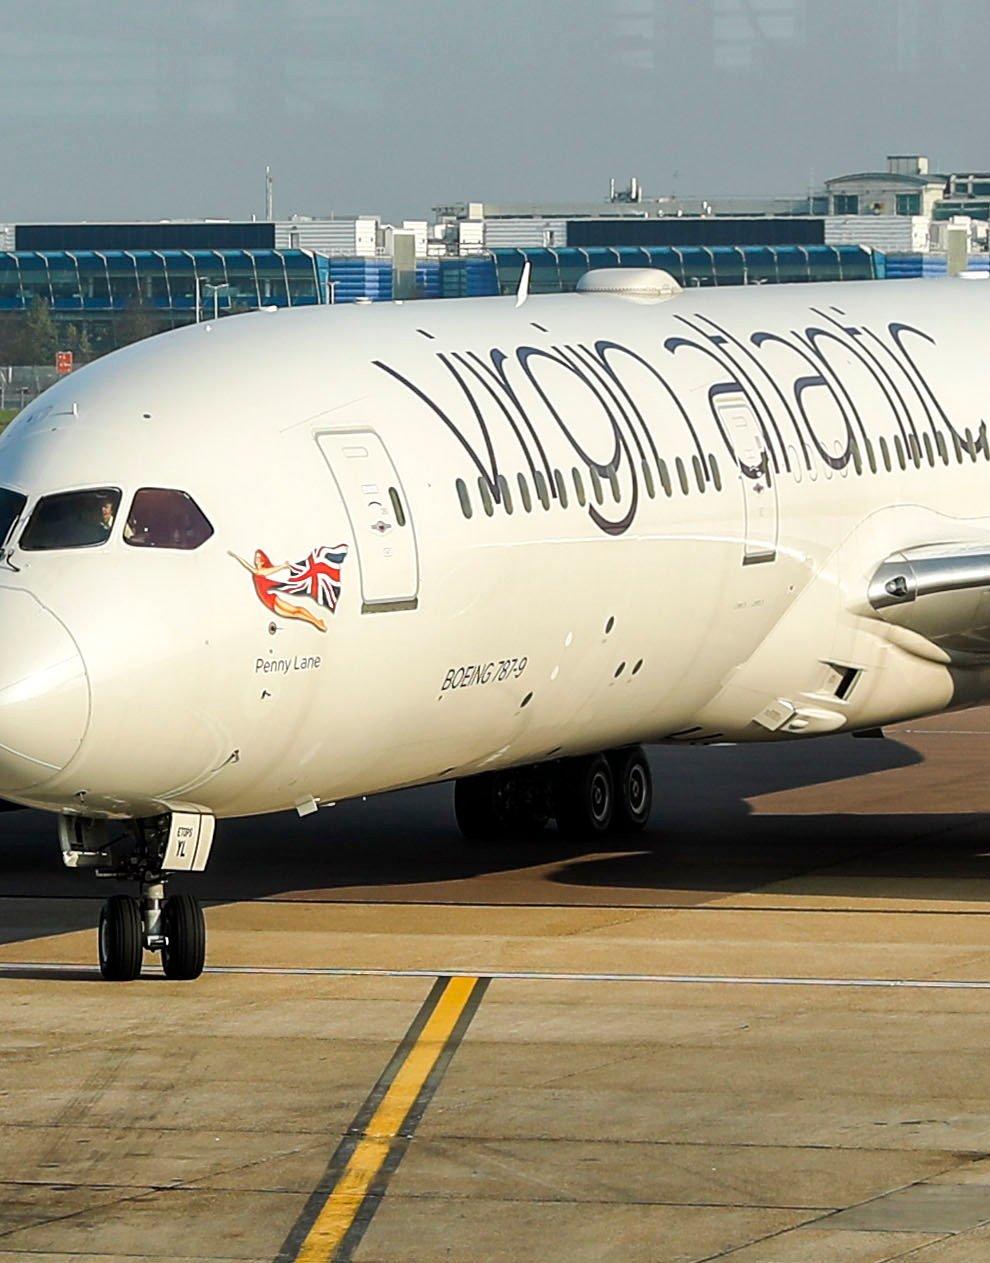 A Virgin Atlantic plane